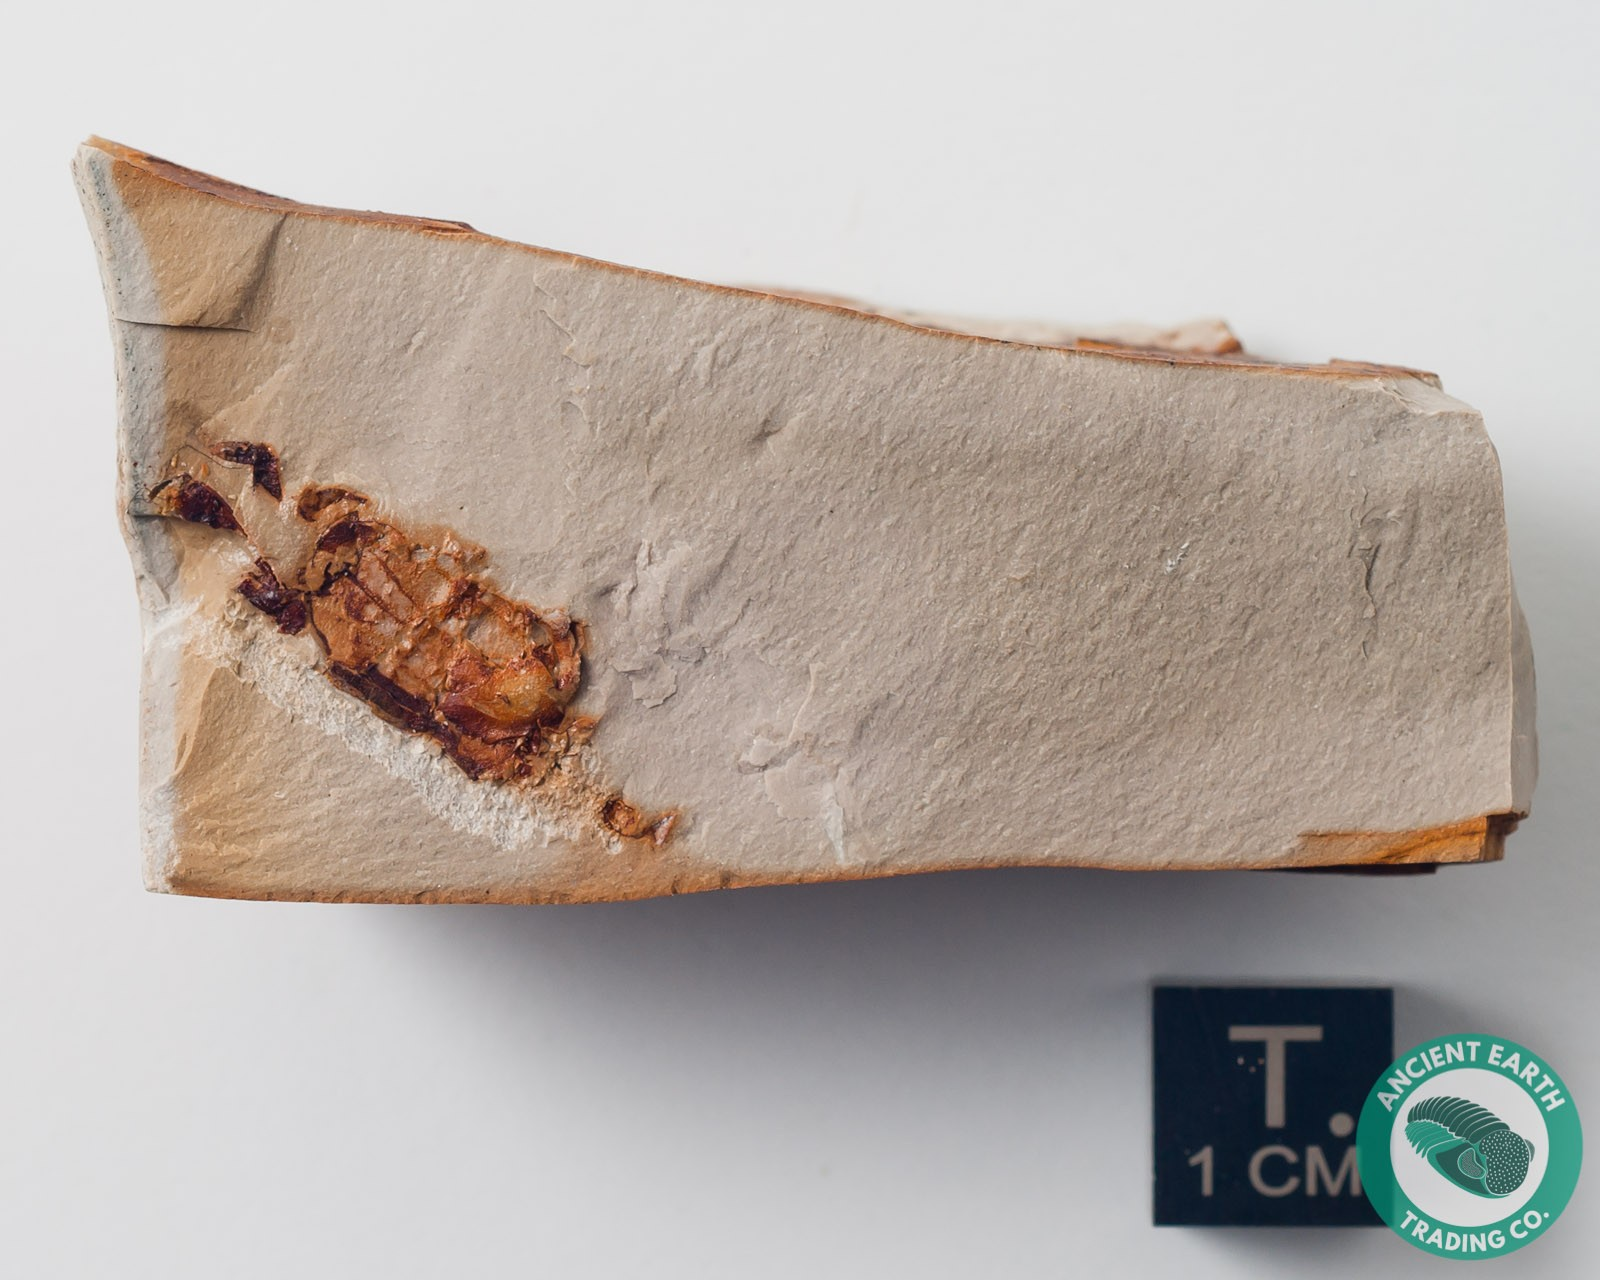 Pea Crab Fossil Pinnixa - California